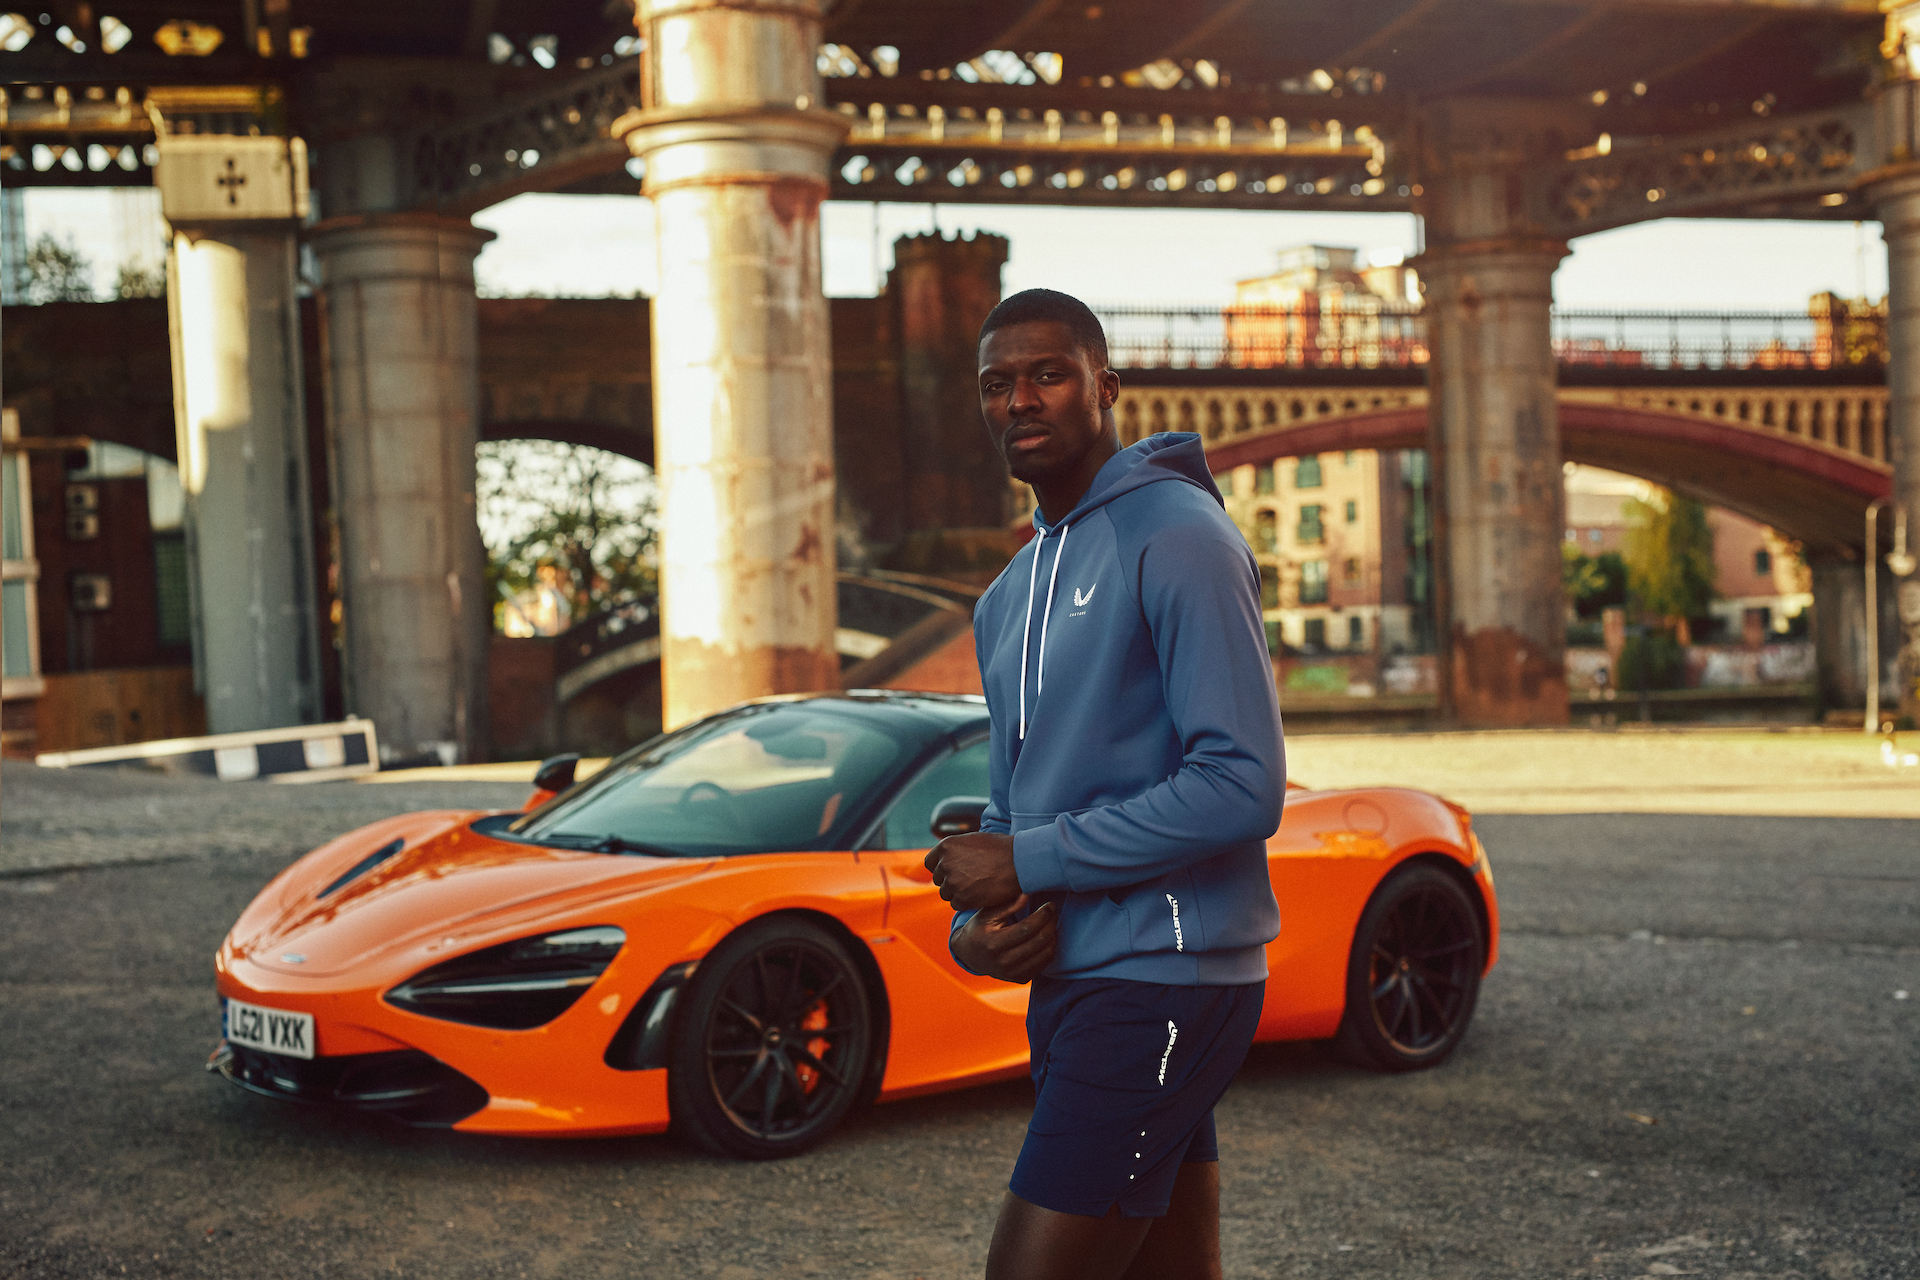 McLaren Automotive and Castore Unveil Summer Sportswear Collection